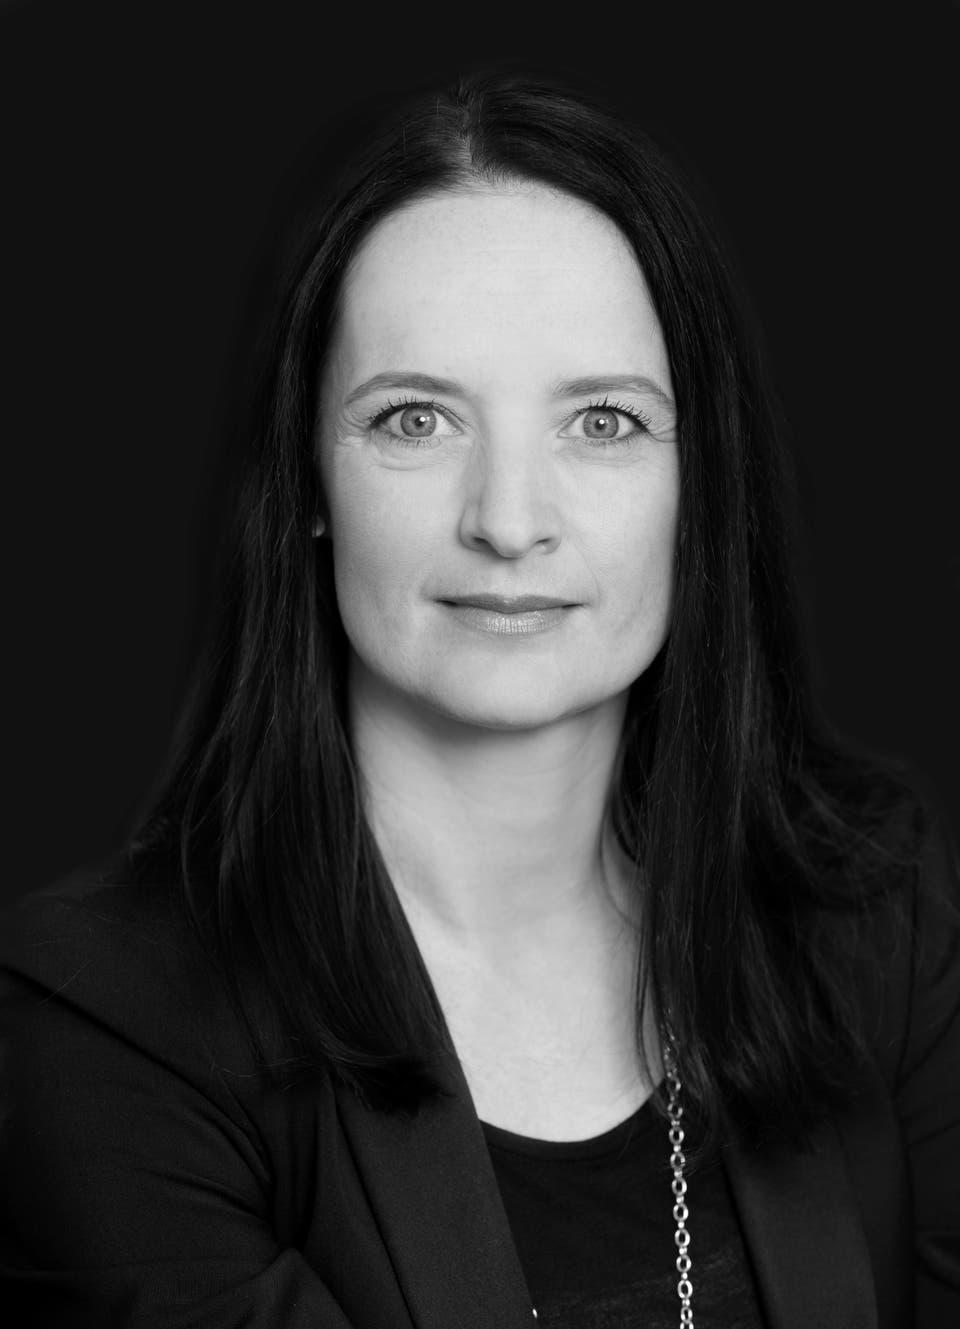 Judith Weiand. Director Corporate Communications dentsu Deutschland & DACH